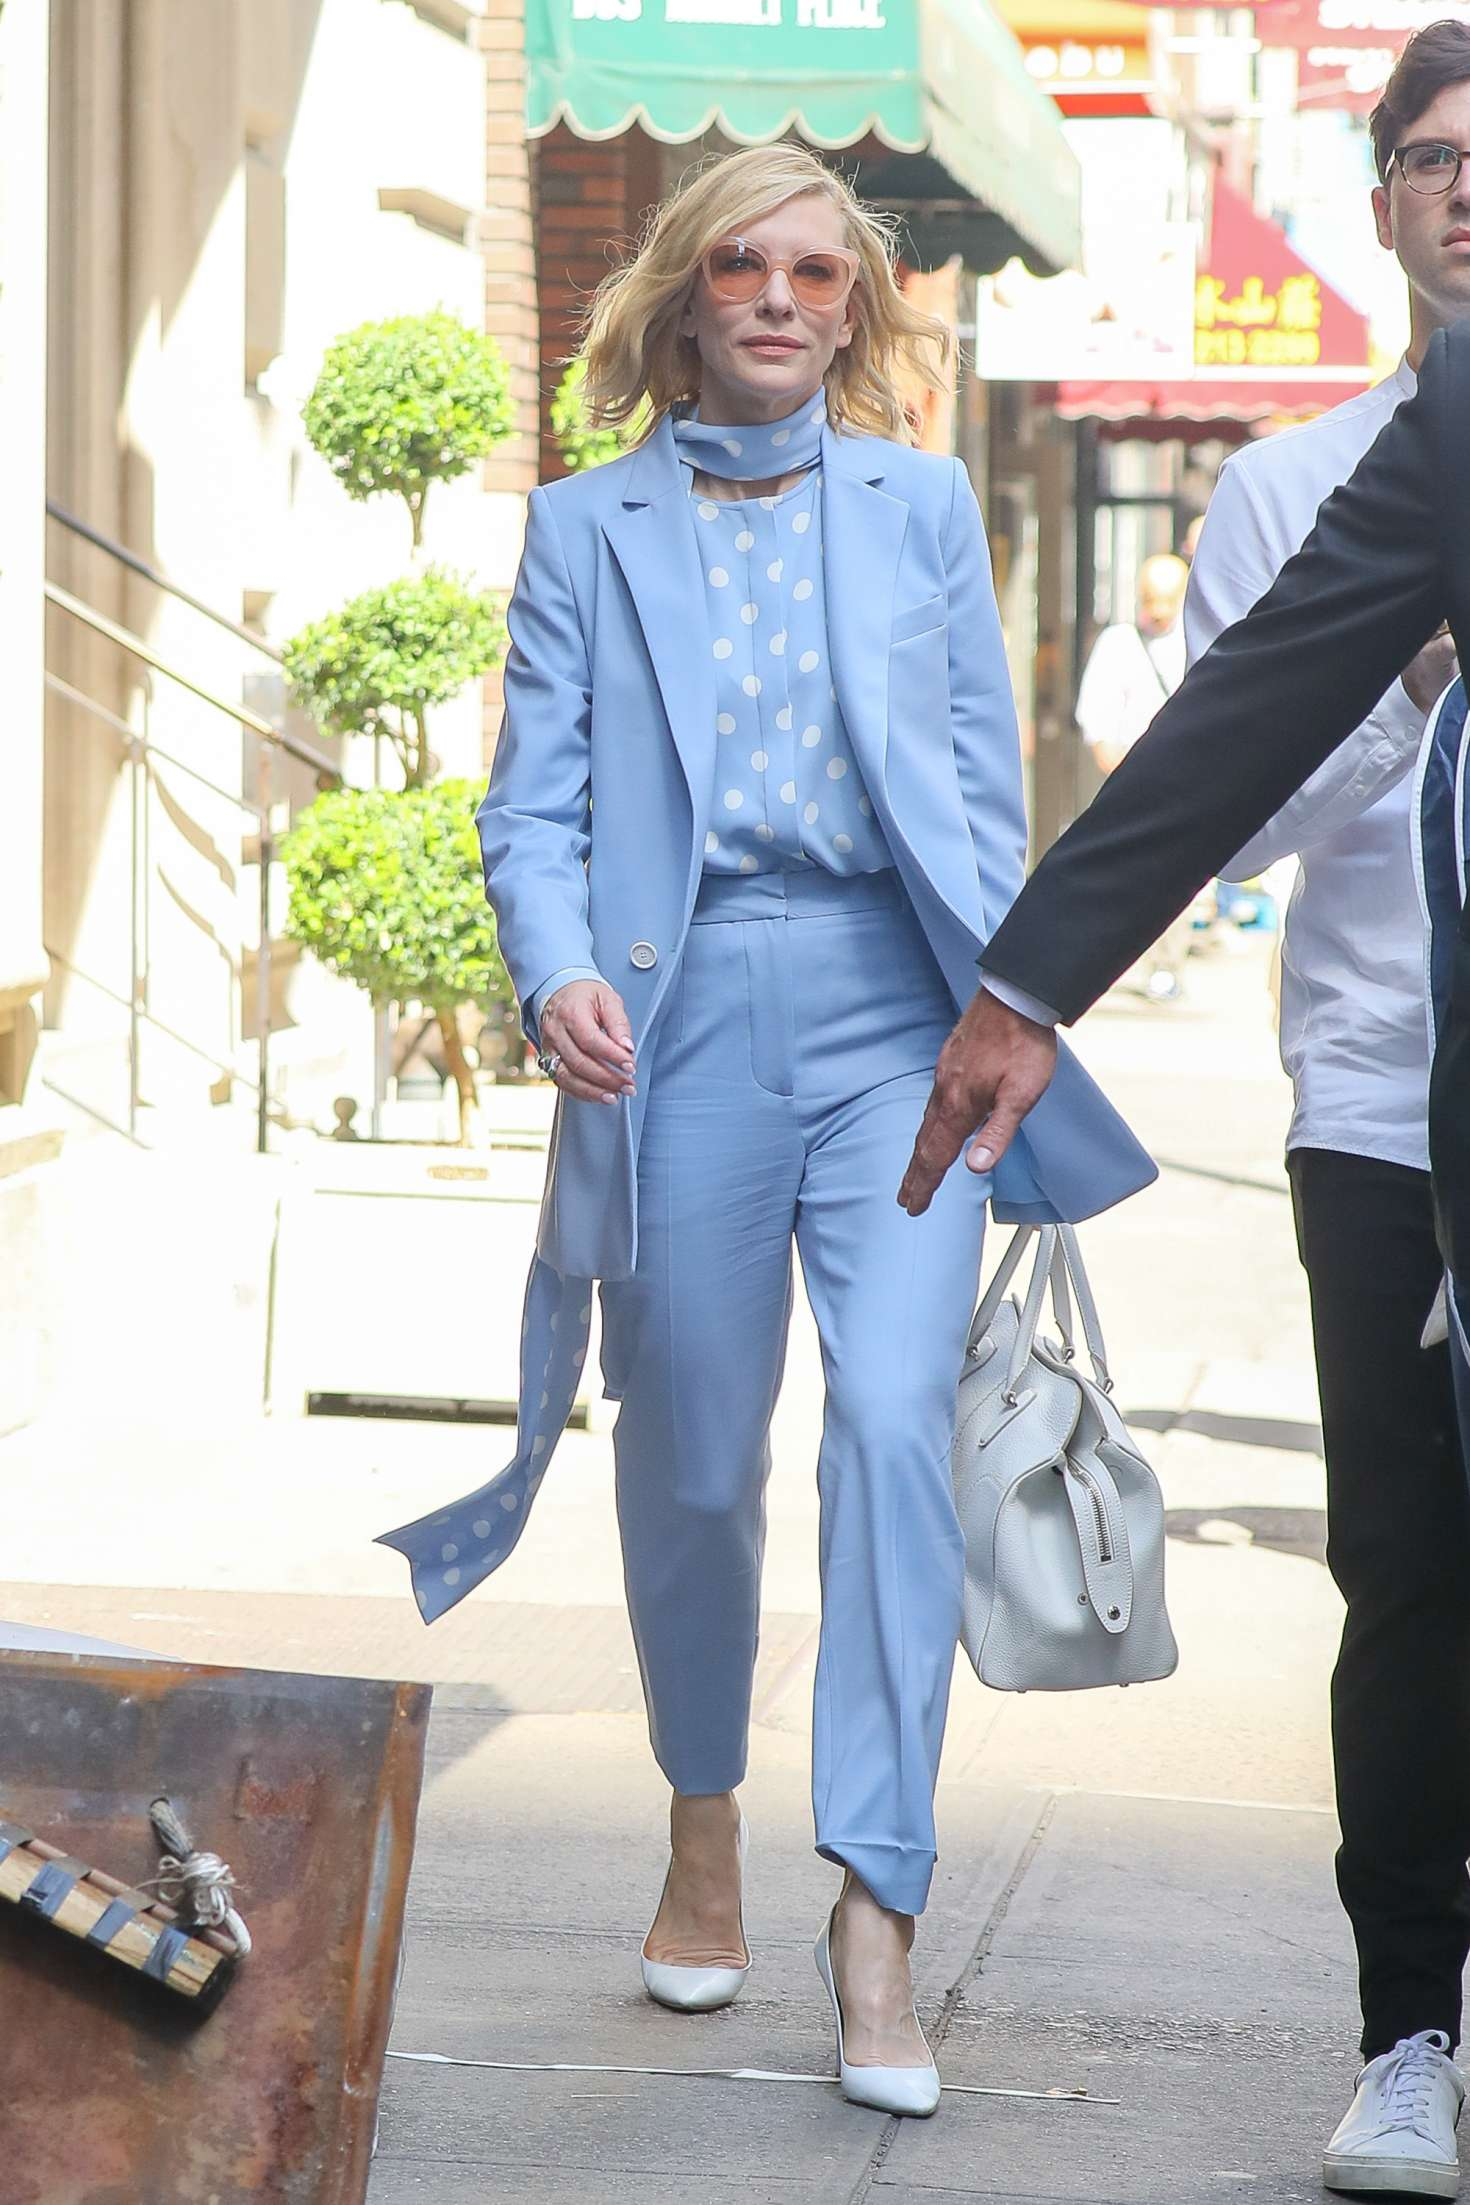 Cate Blanchett 2018 : Cate Blanchett in Light Blue outfit -05